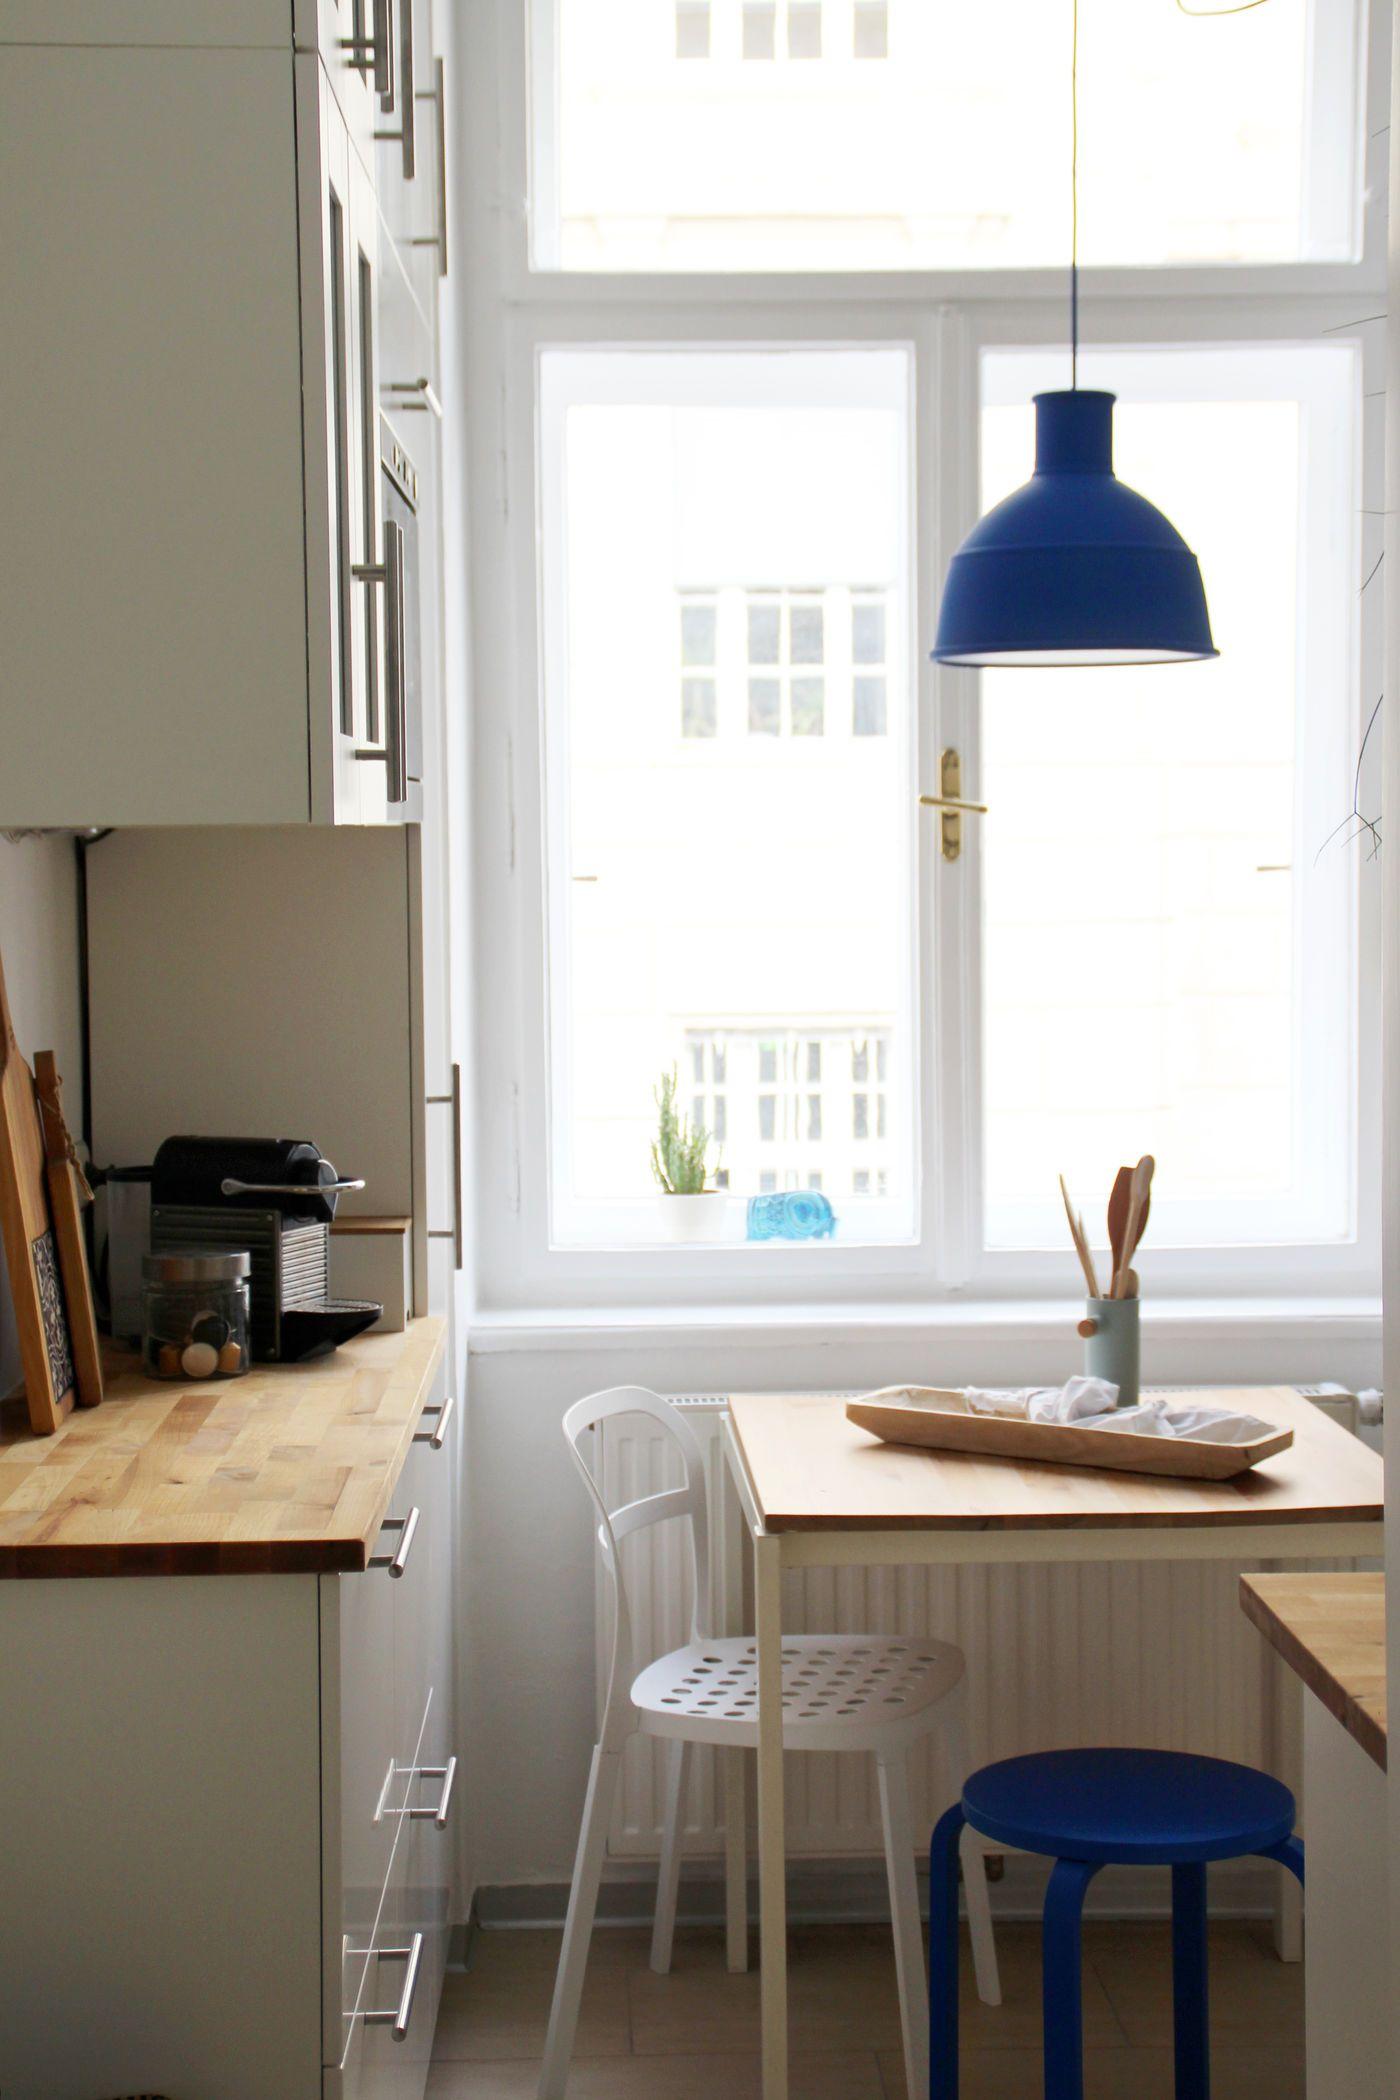 elektroger te k che tipps k che ohne elektroger te planen. Black Bedroom Furniture Sets. Home Design Ideas